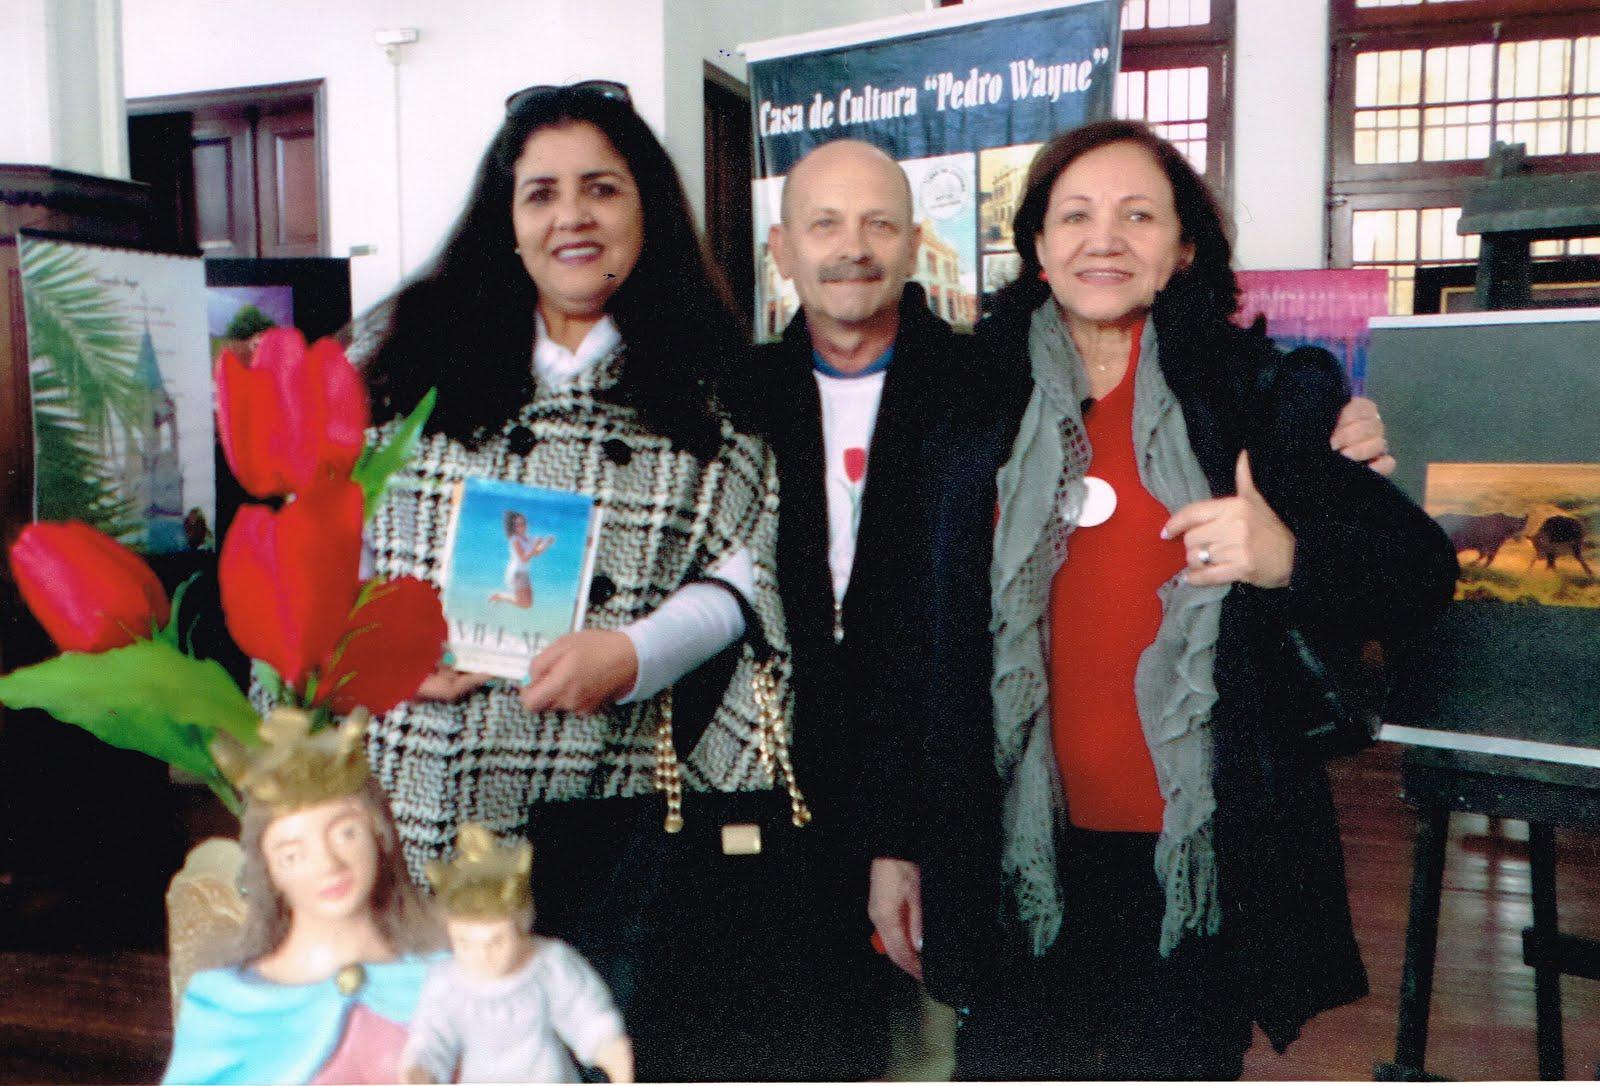 Manoel Ianzer, Claudia Romariz e Lú Ianzer